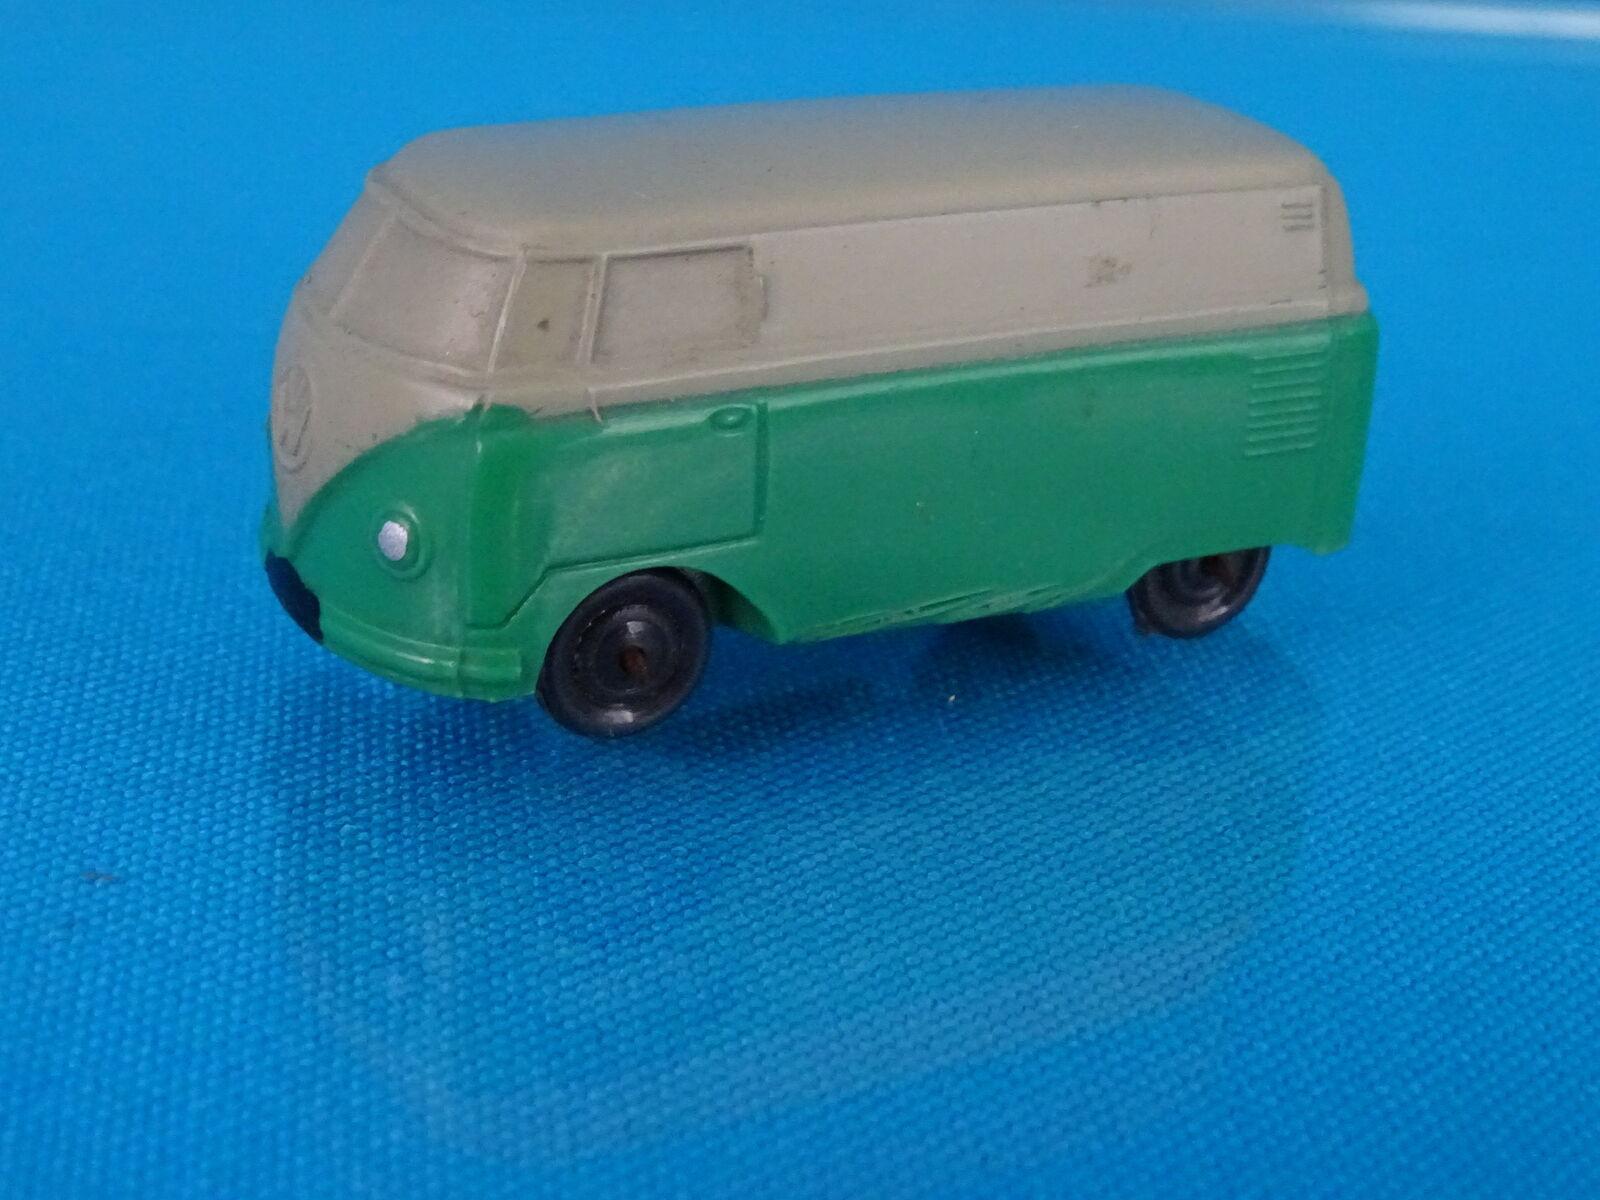 Marklin 860 5 M VW Van Green Grey 1953 HO Scale logo